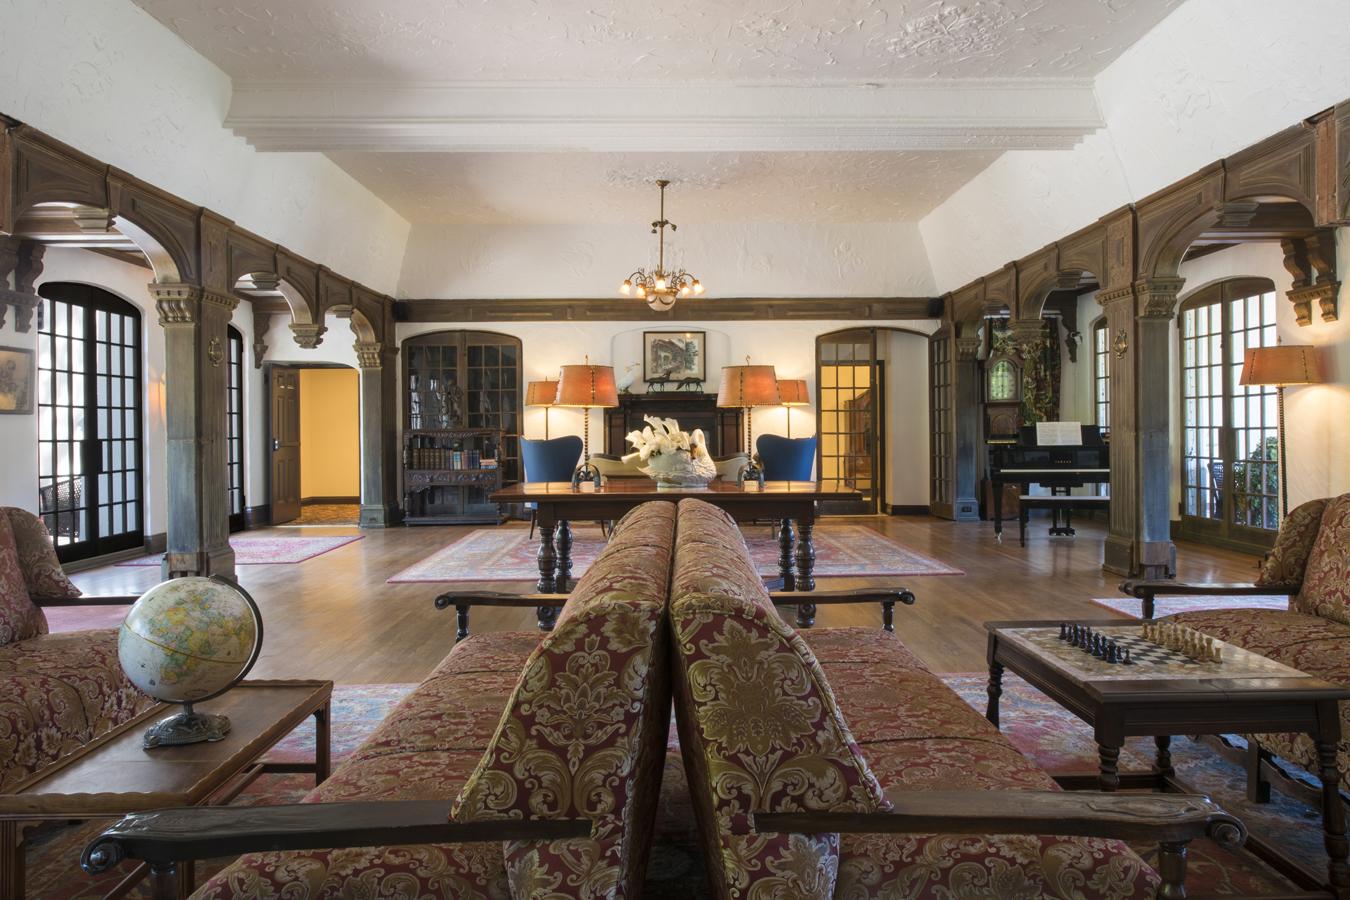 The Upper Lobby